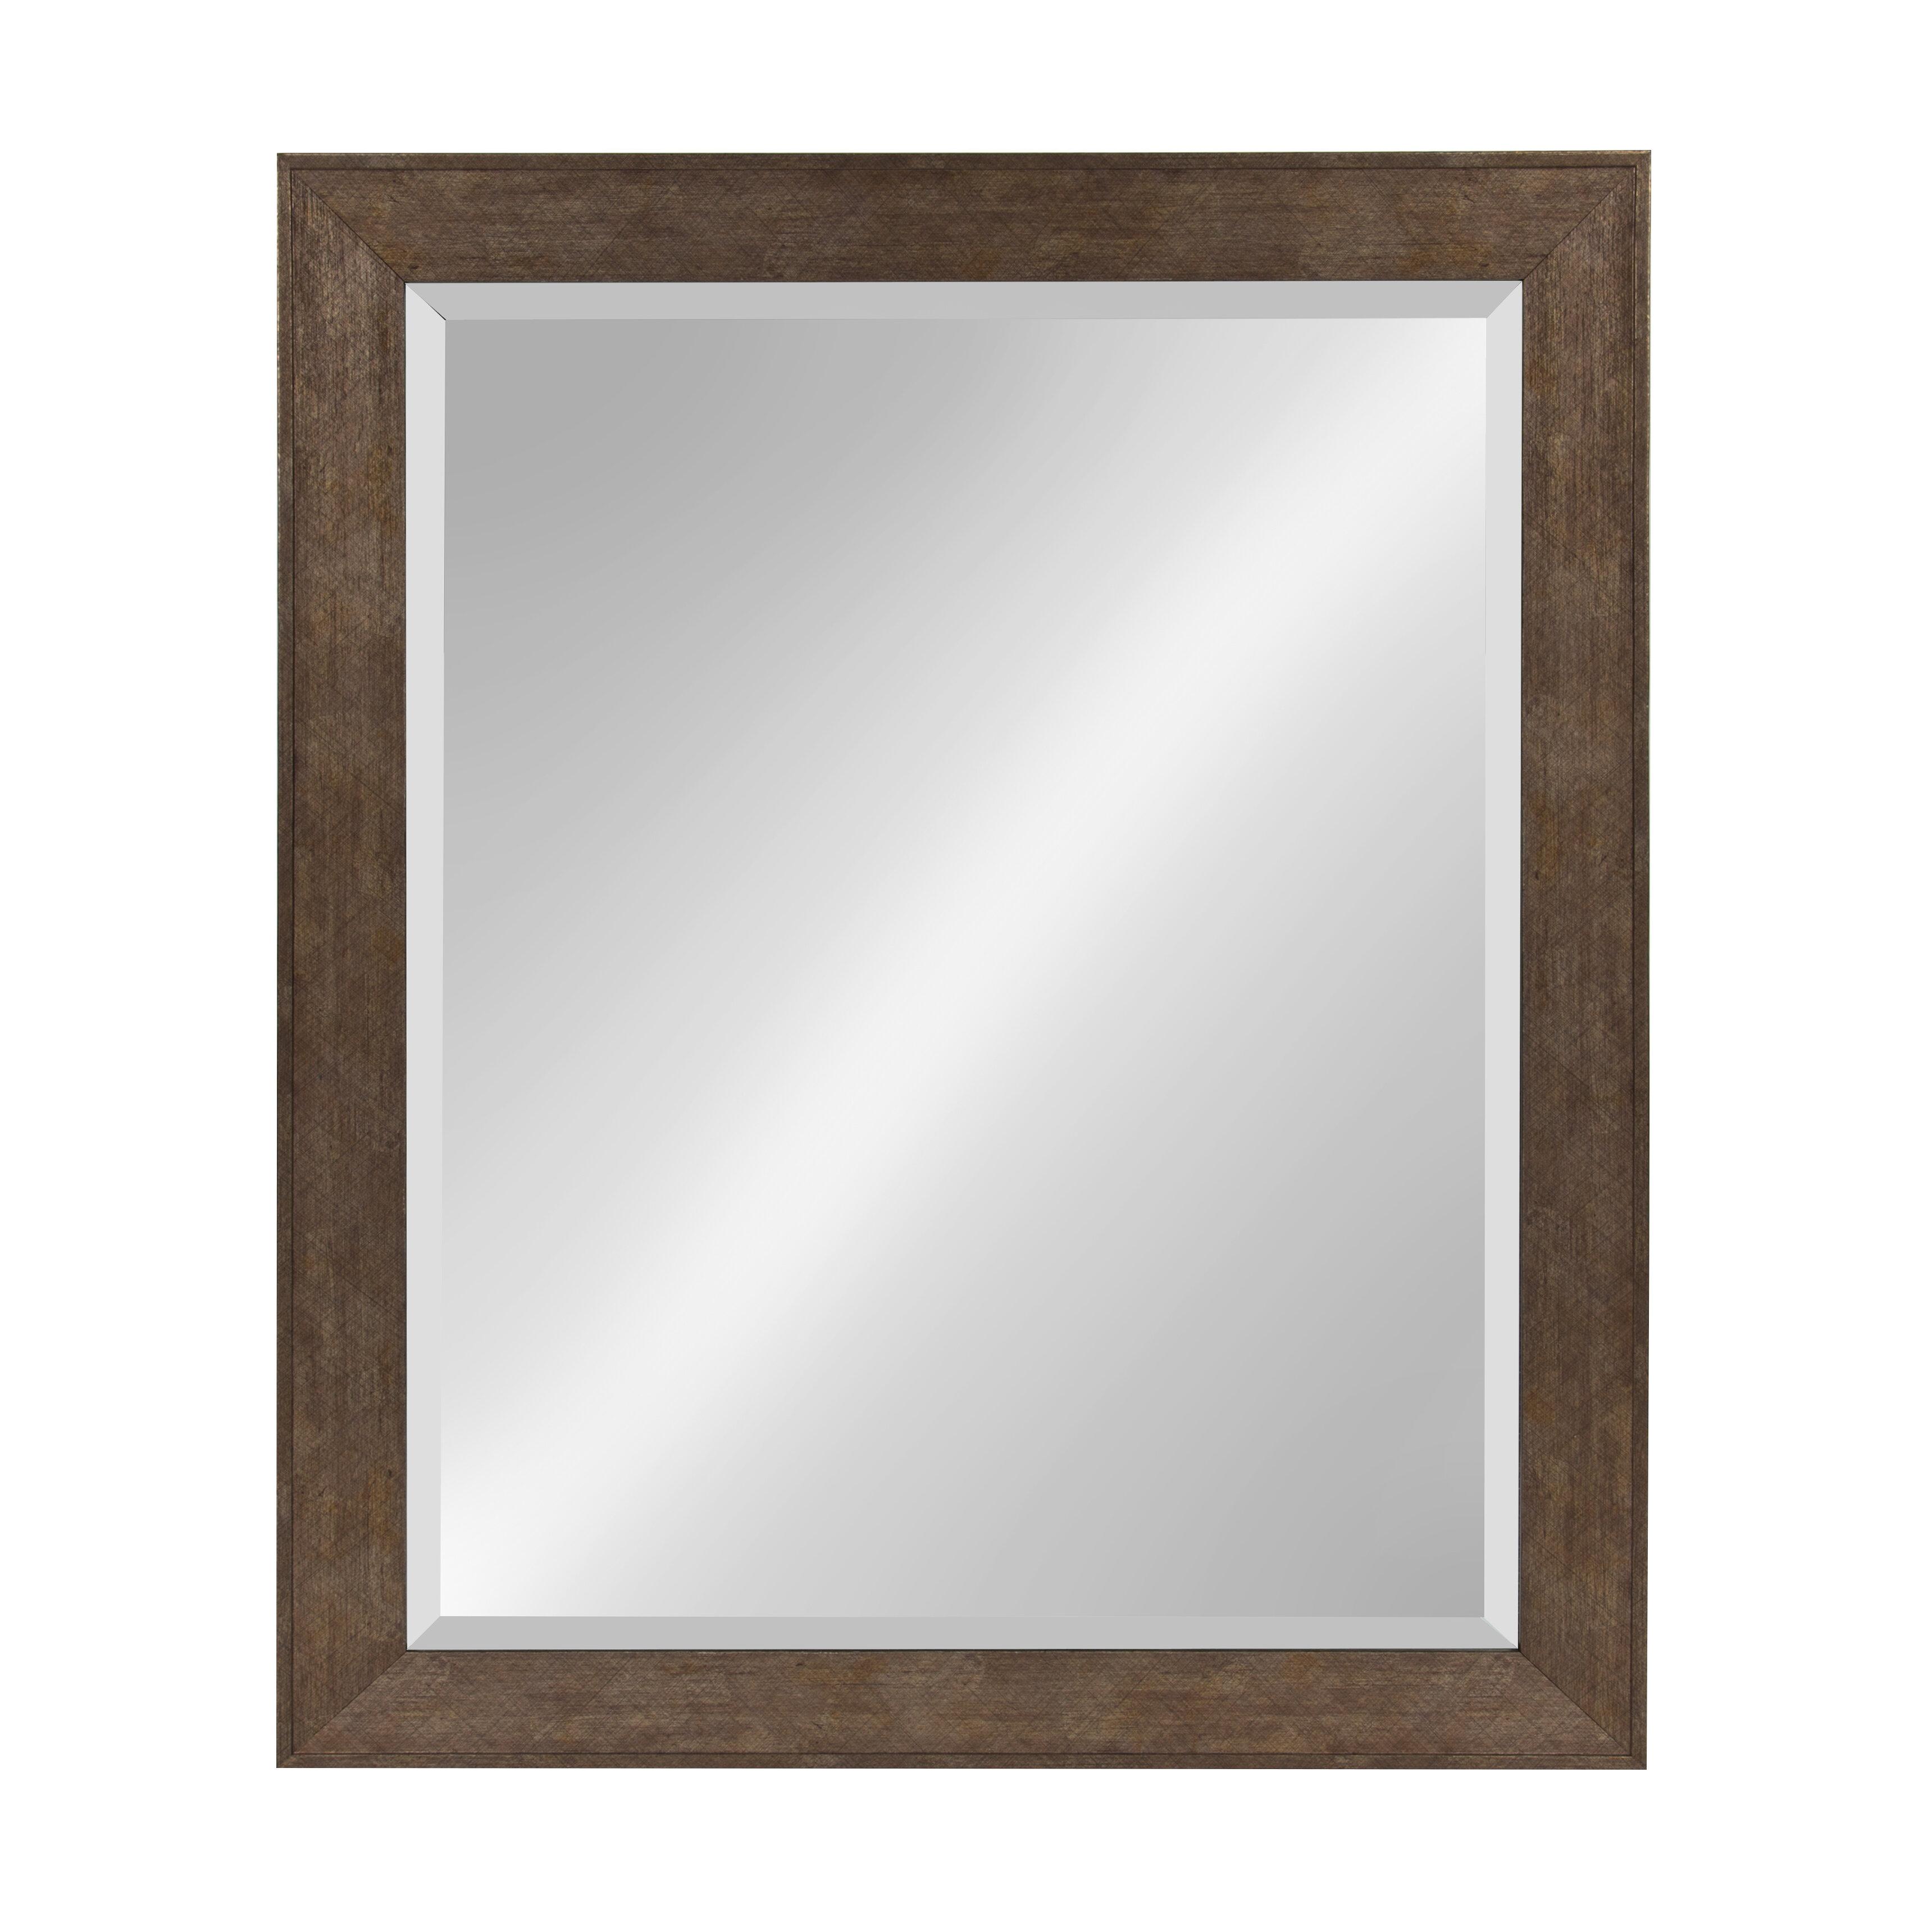 Gracie Oaks Yonker Beveled Accent Mirror Wayfair